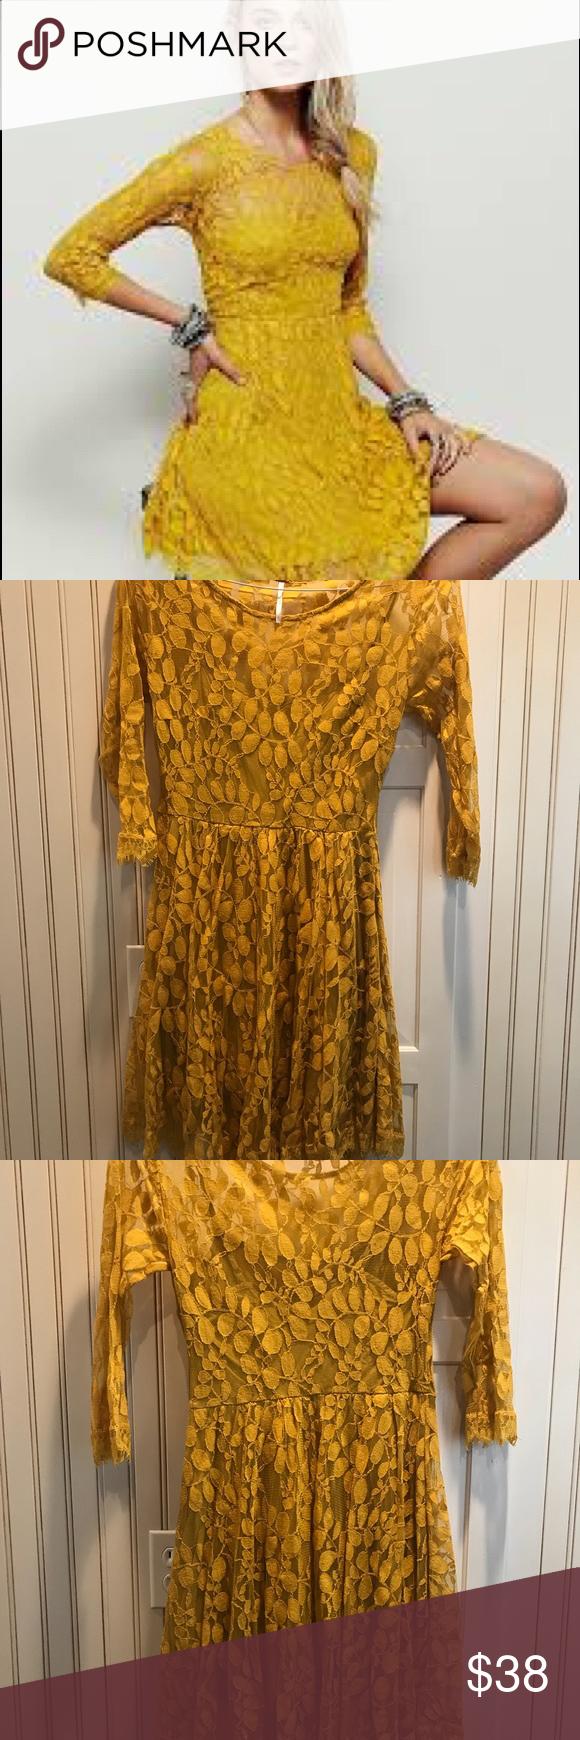 Yellow dress long sleeve  Free people yellow lace dress  Lace dress People dress and Free people